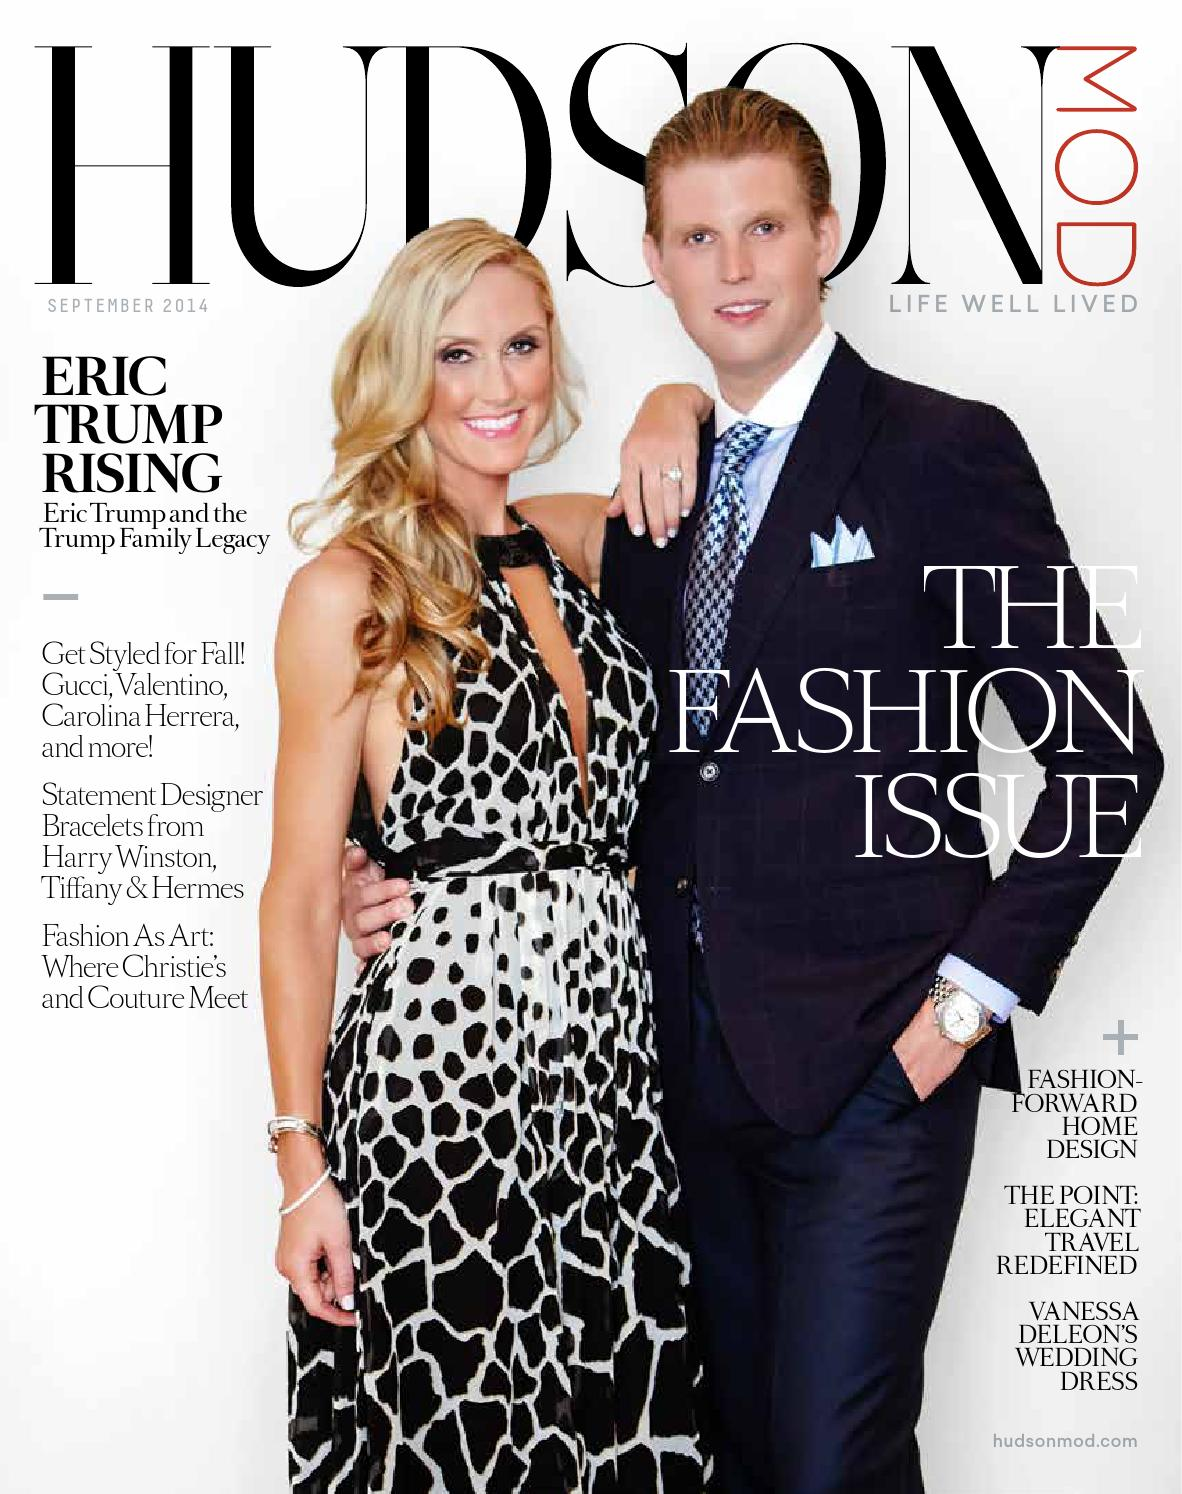 HudsonMOD September 2014 Issue by MOD Media, LLC - issuu 1bf17b64e013